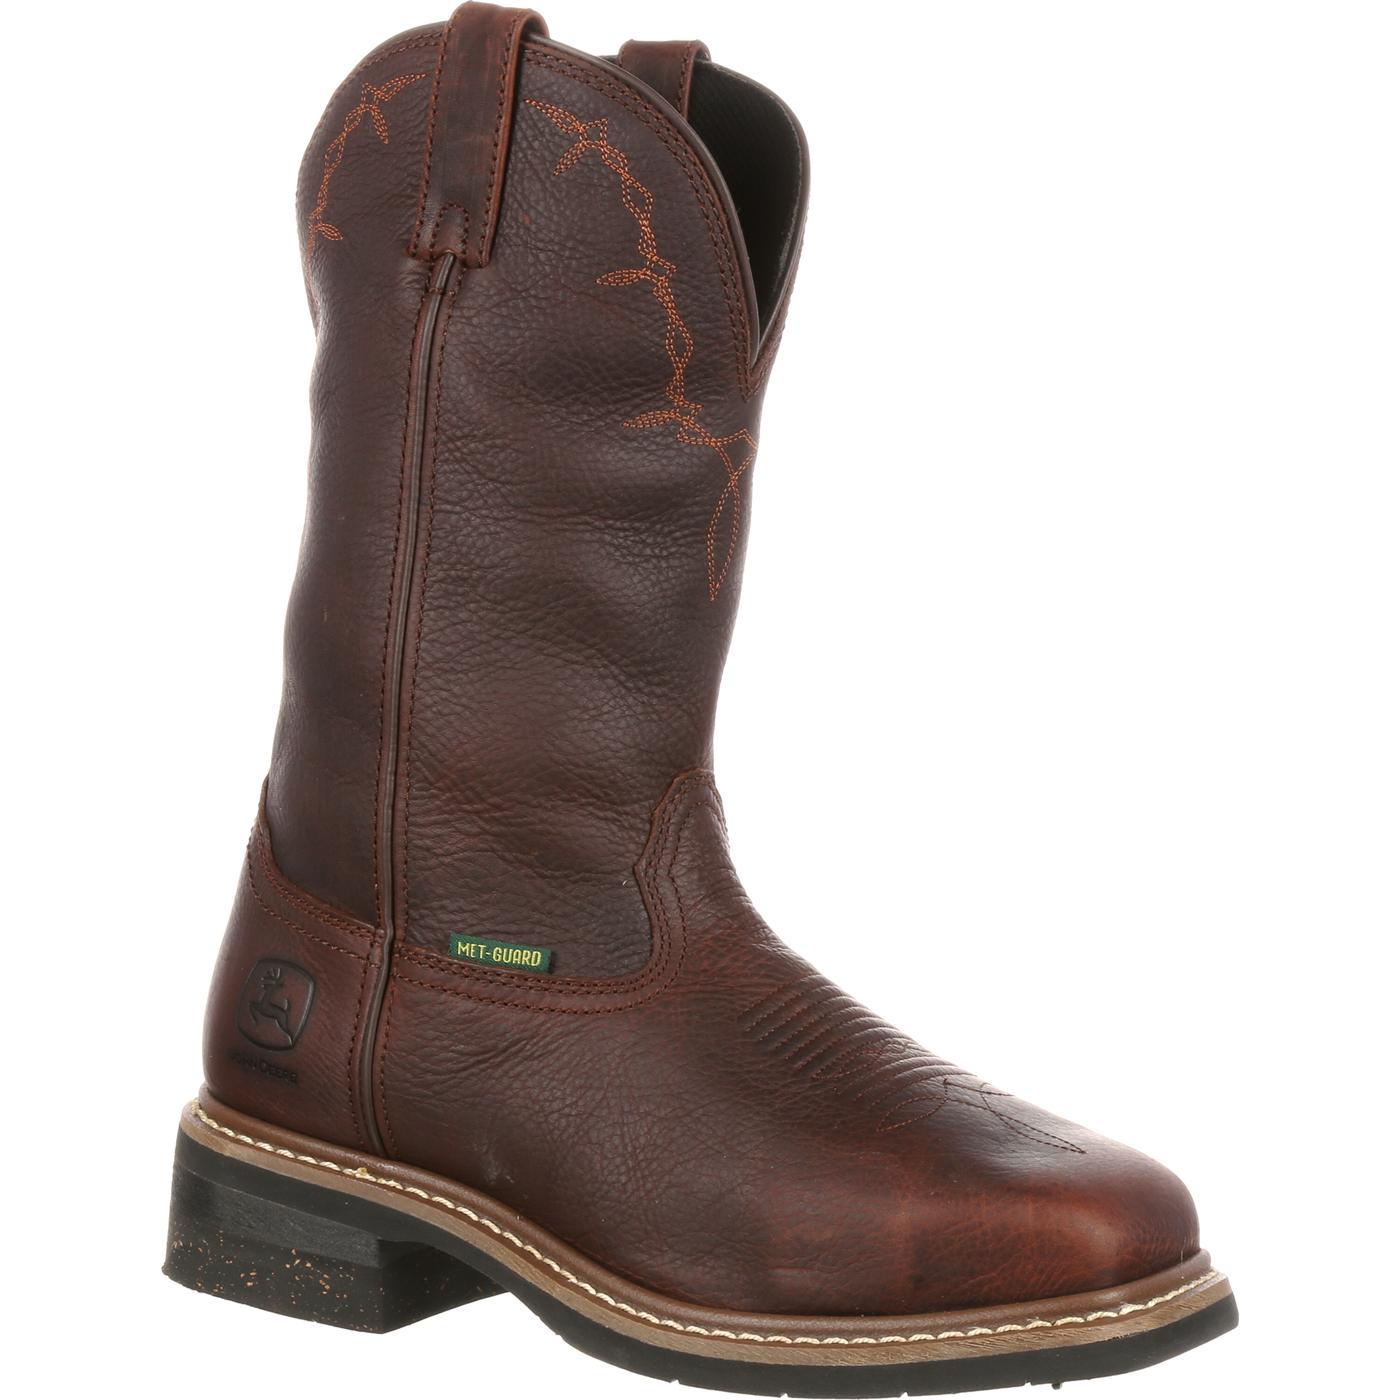 05f5452470f John Deere Steel Toe Met-Guard Series Wellington Work Boot